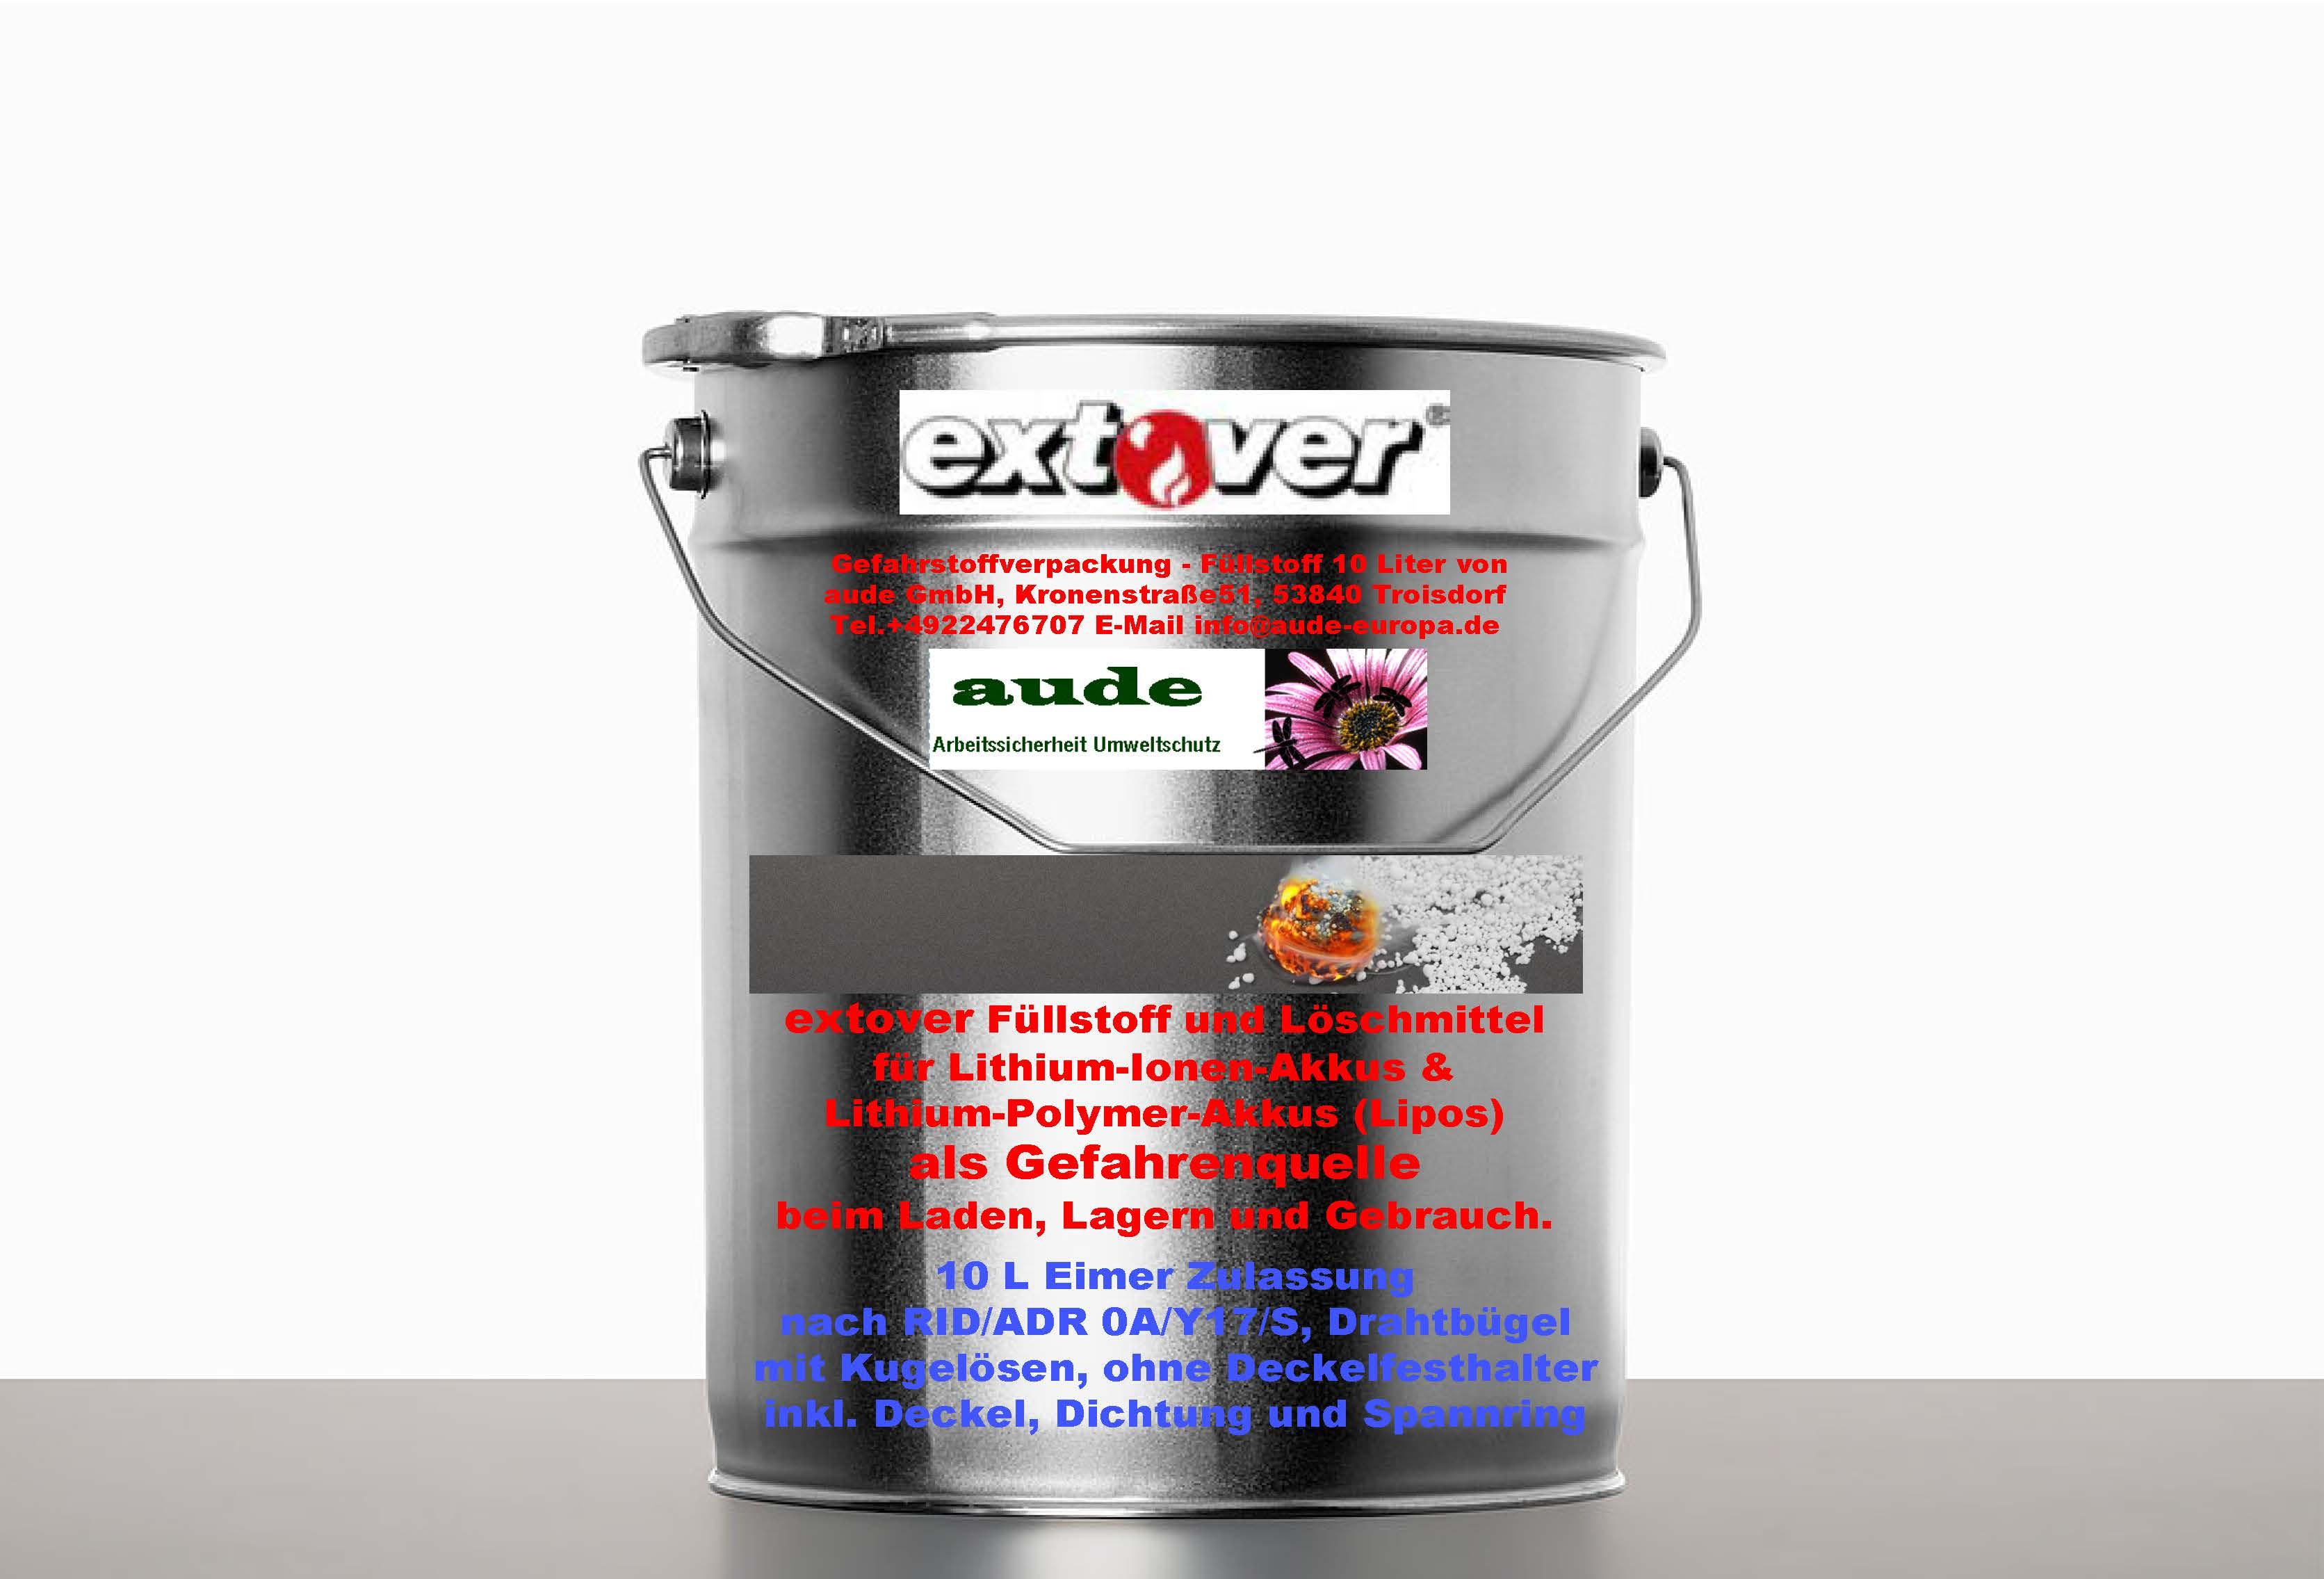 10-Liter_13-0010-45-15-05-28-besaudecsbAH6vm7L1zB